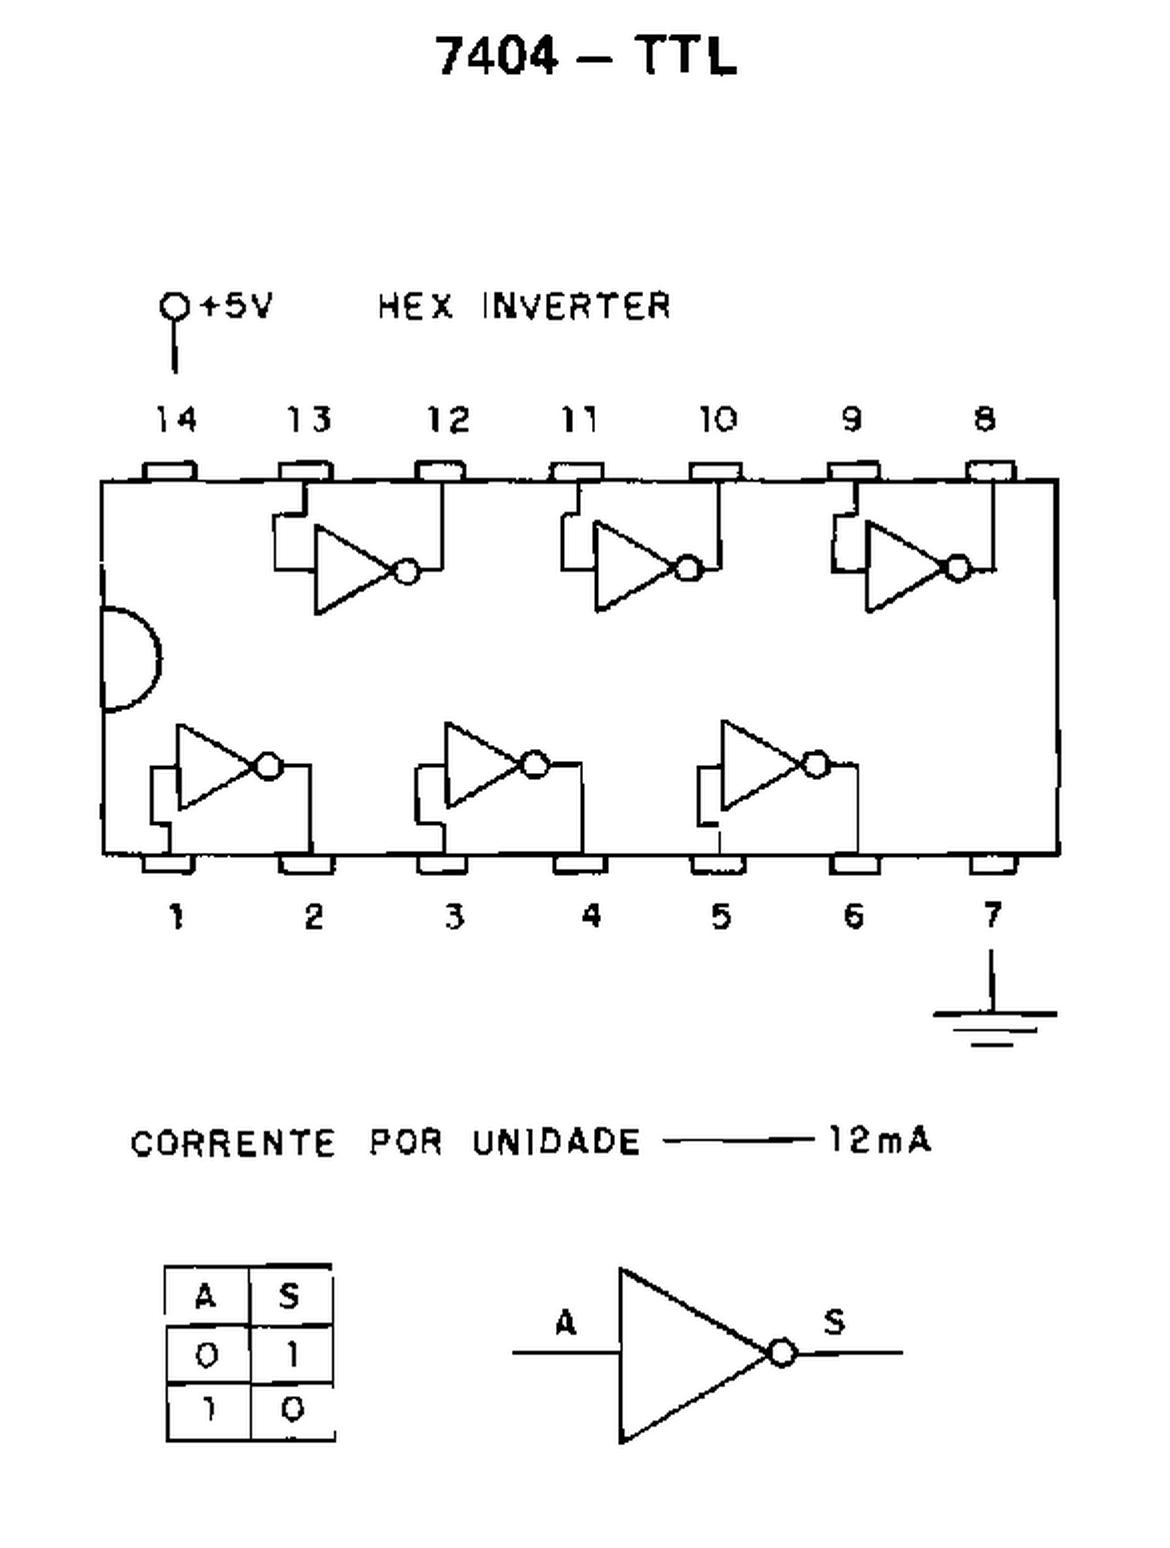 Circuito Integrado 7404 : EletrÔnica geral circuito integrado